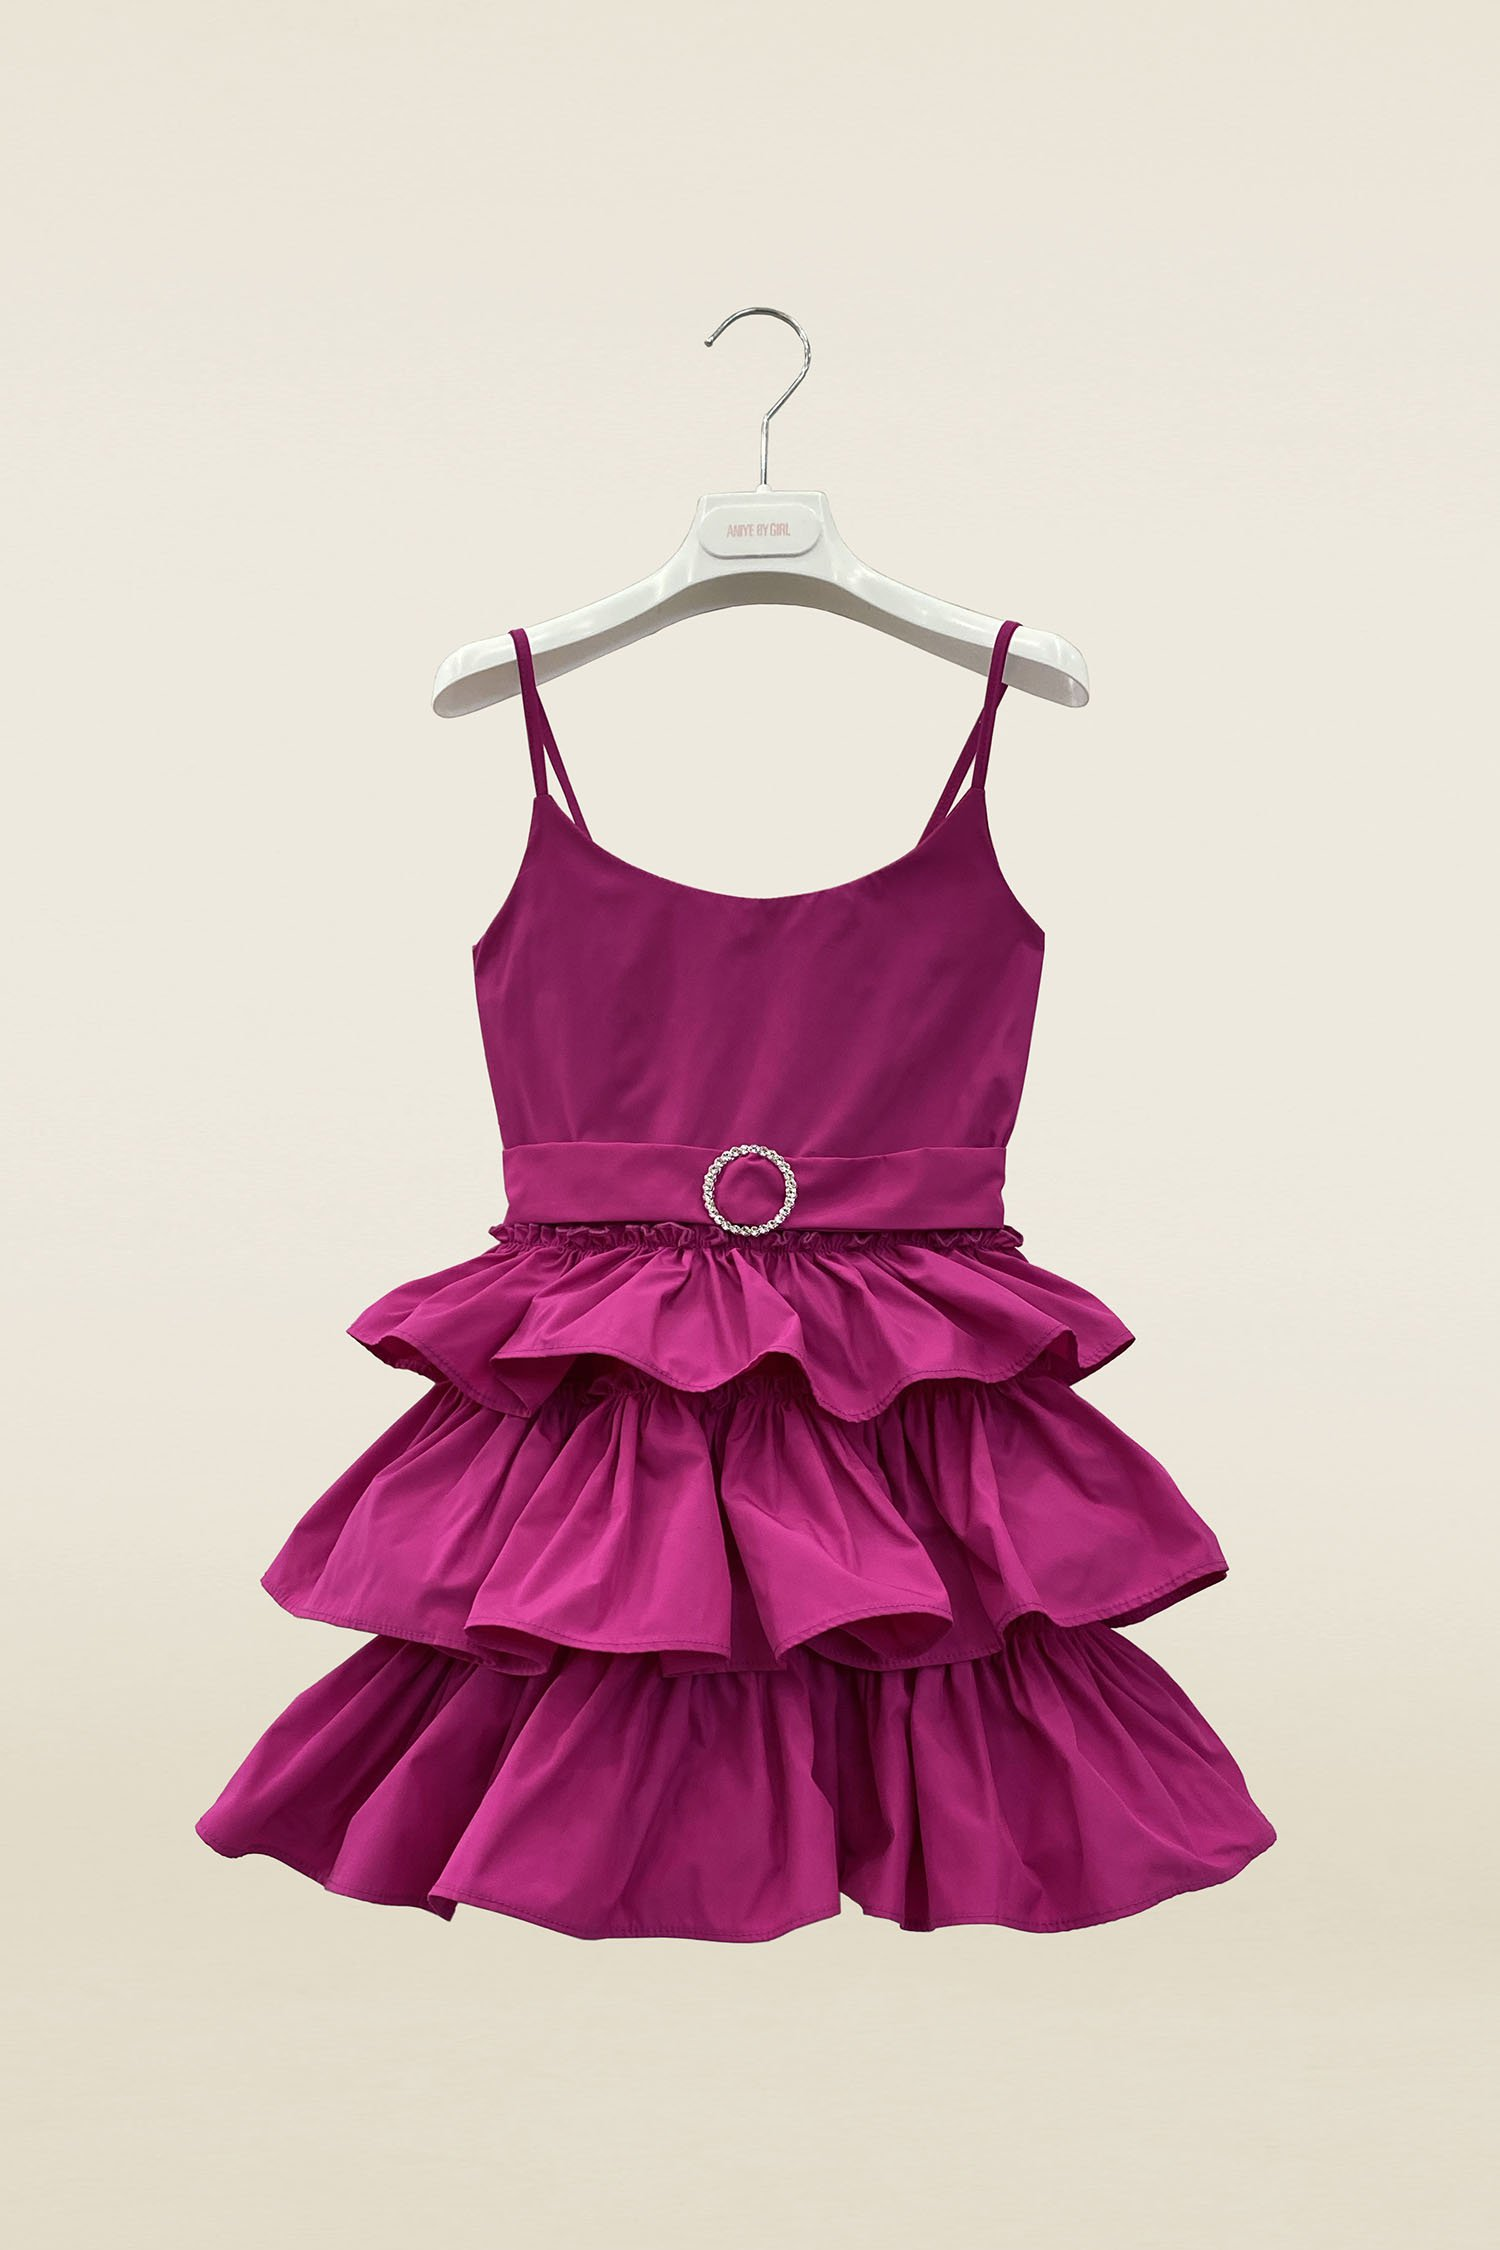 DRESS TAFFY - GIRL